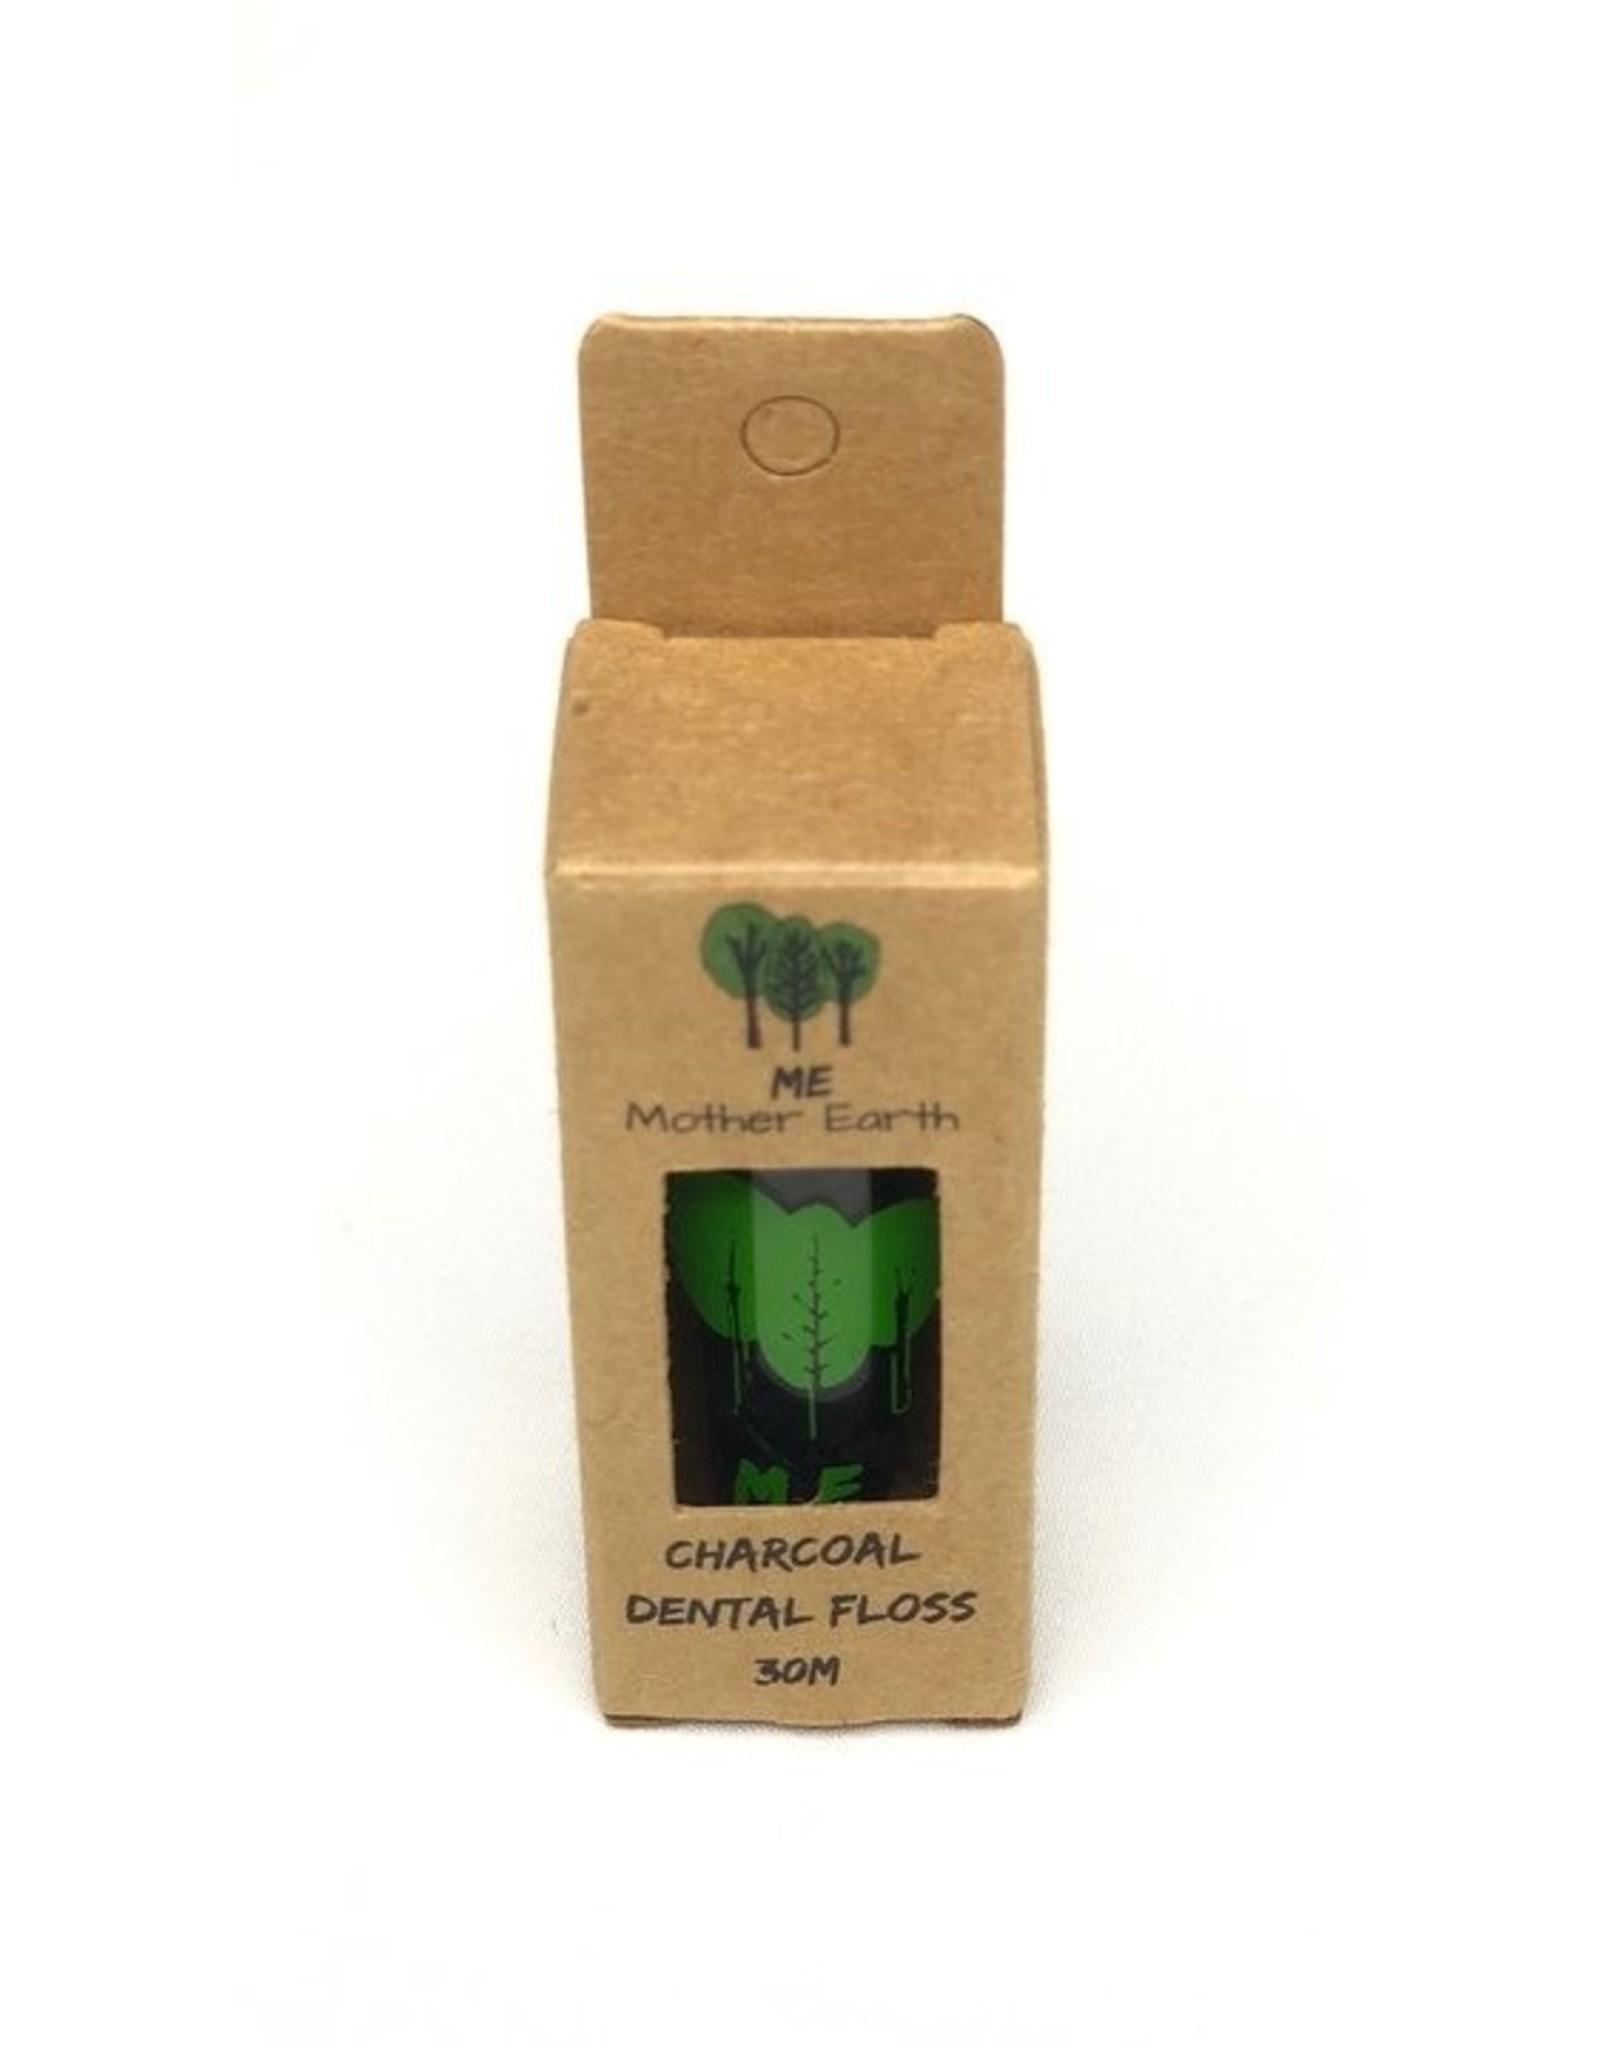 Biodegradable Charcoal Dental Floss